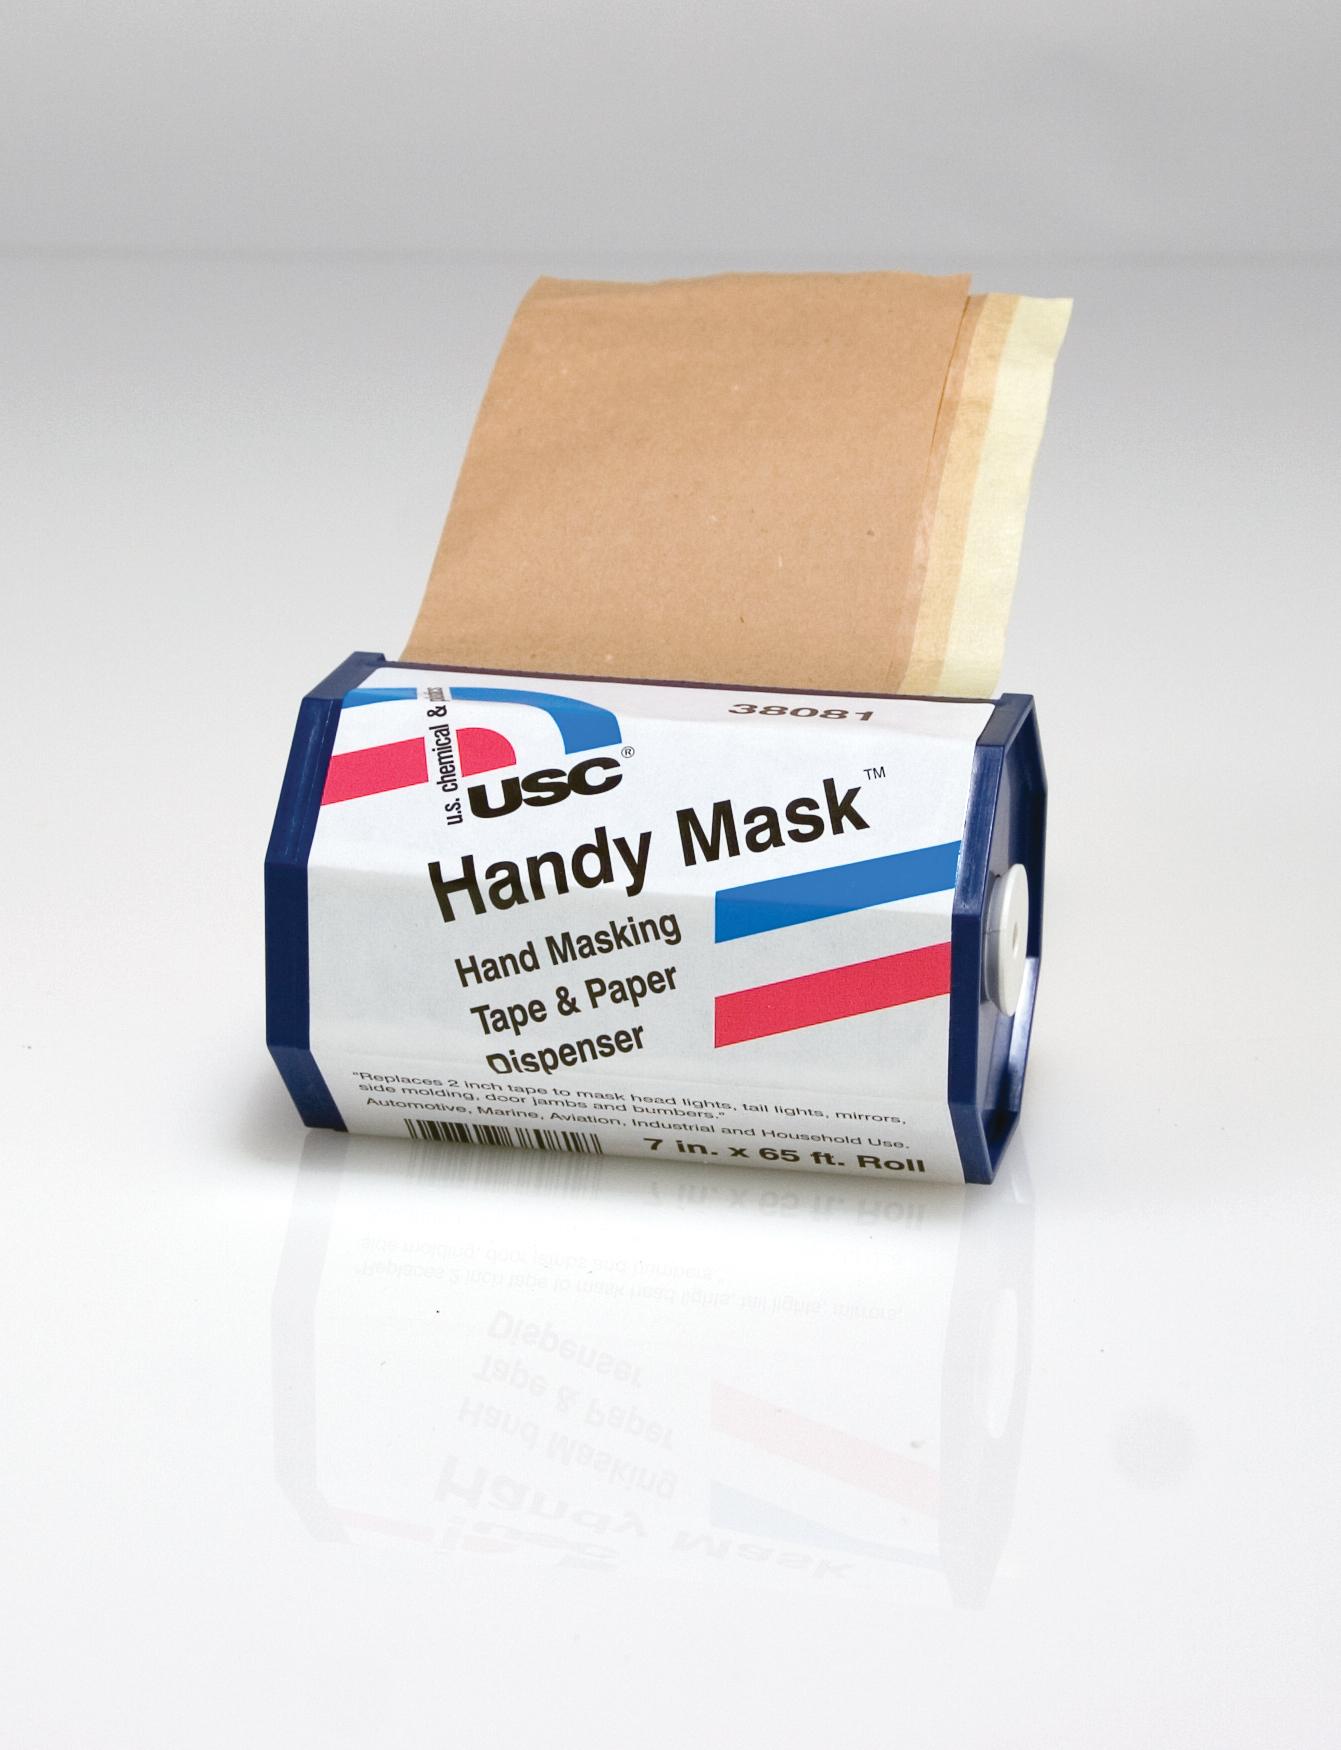 USC-38081-Handy-Mask